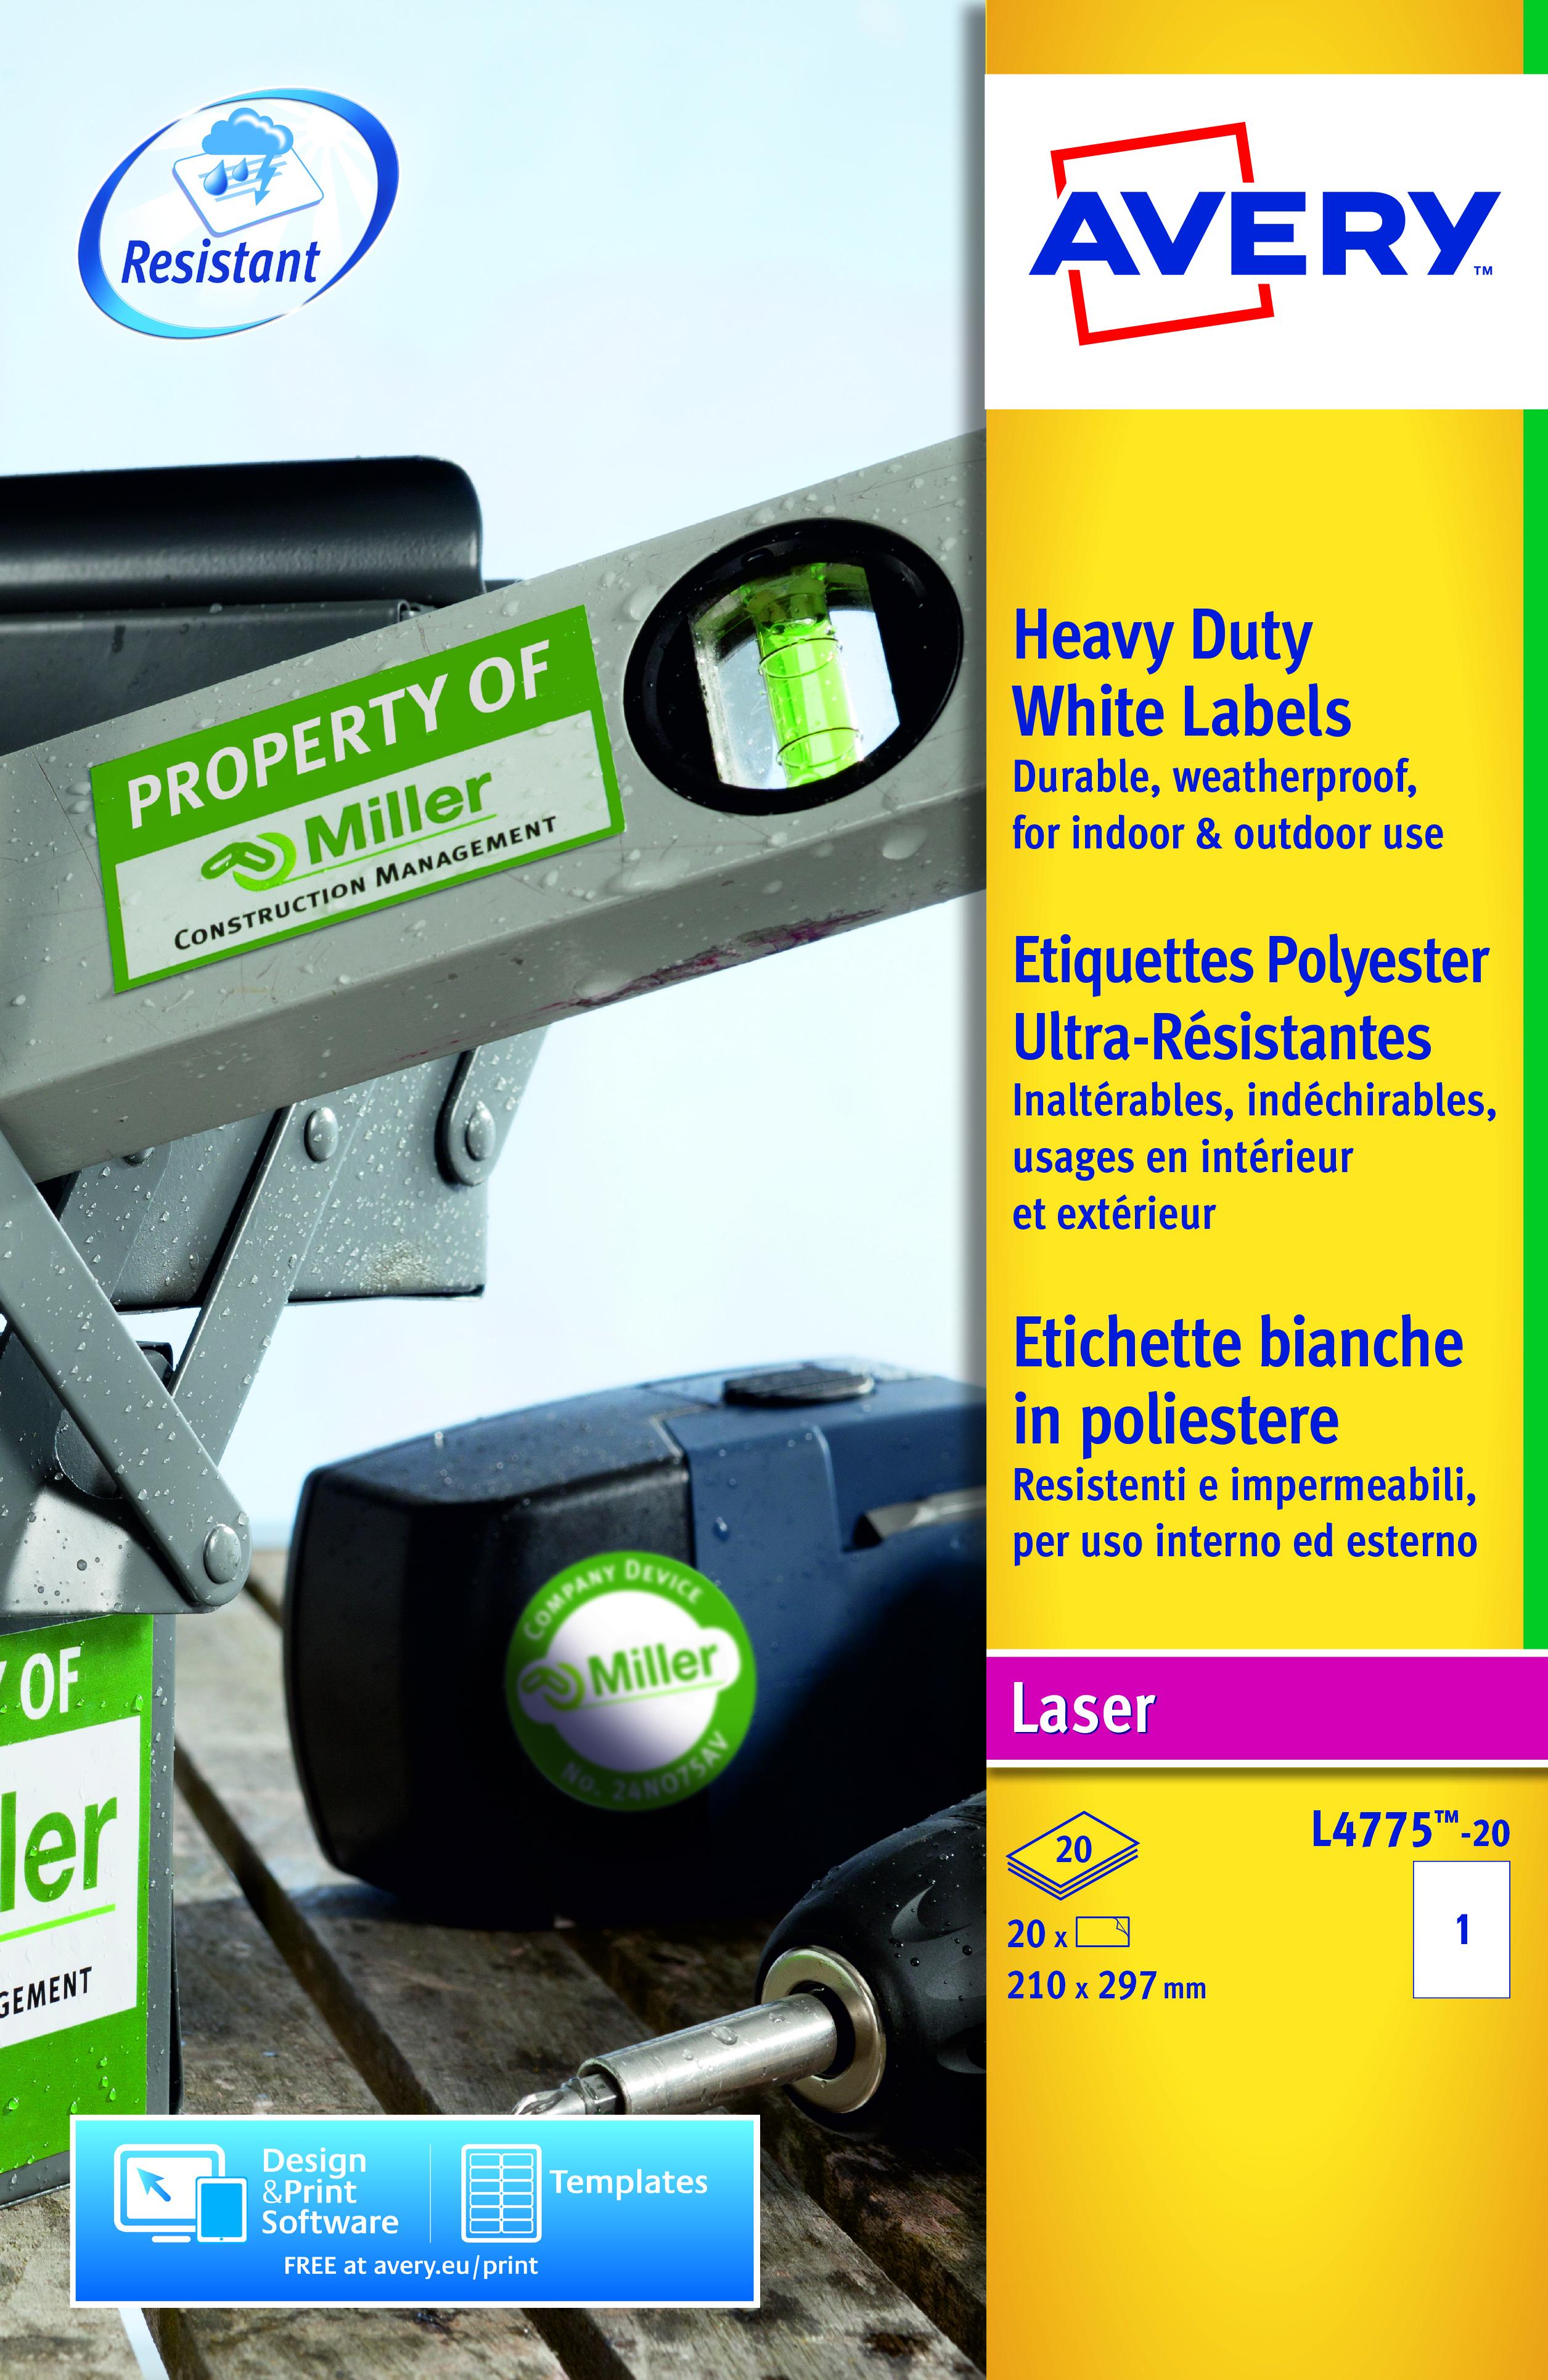 Avery HeavyDuty Label 210x297mm PK20